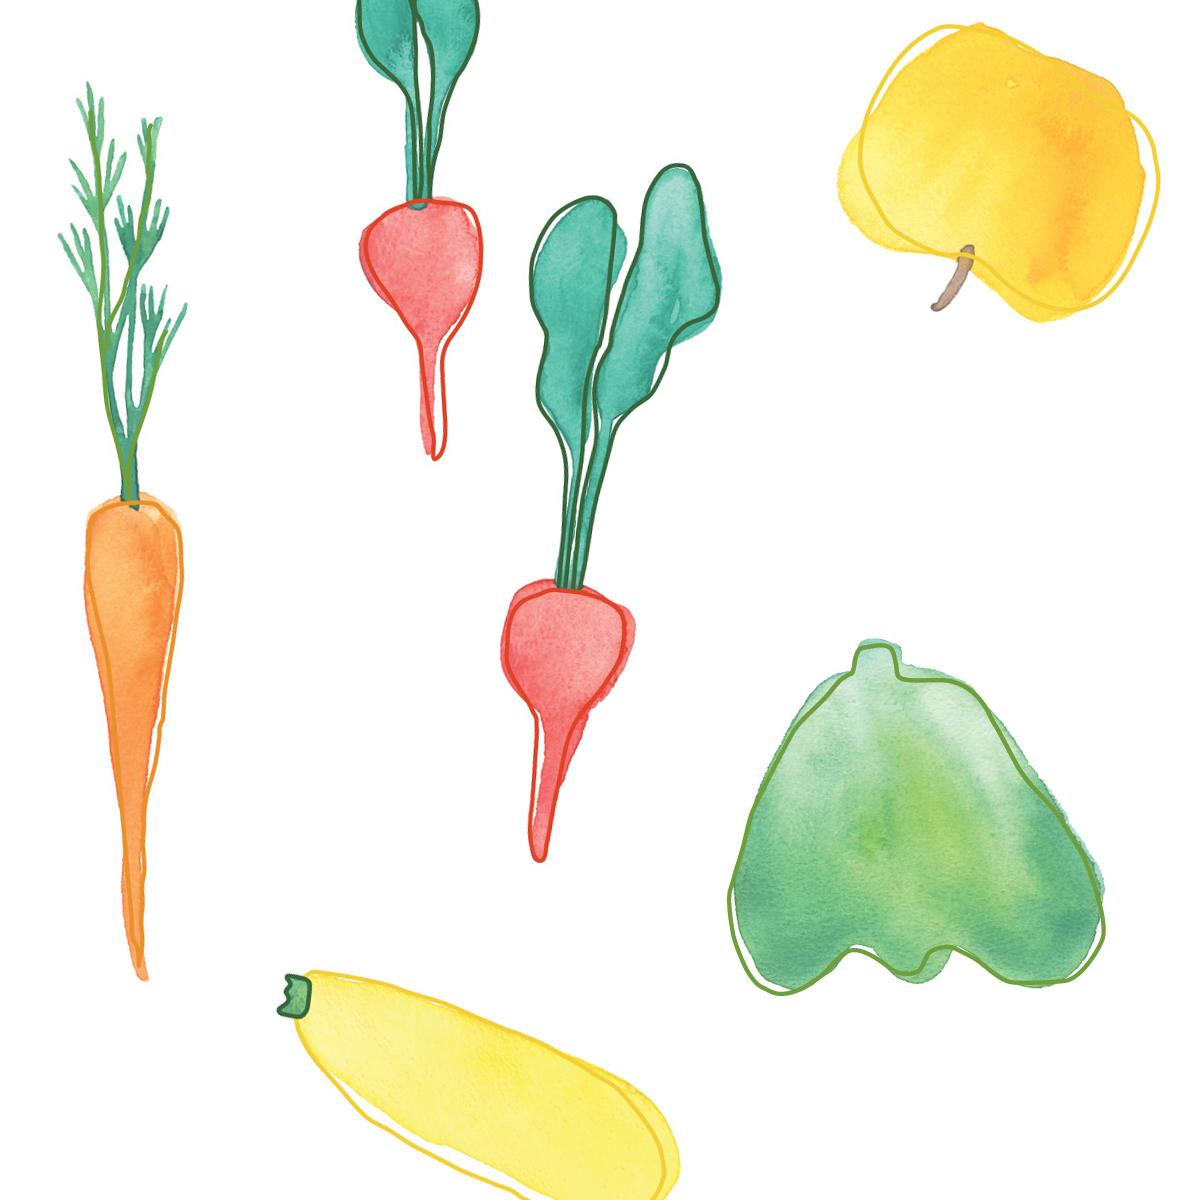 watercolor illustrations, custom illustration vegetables